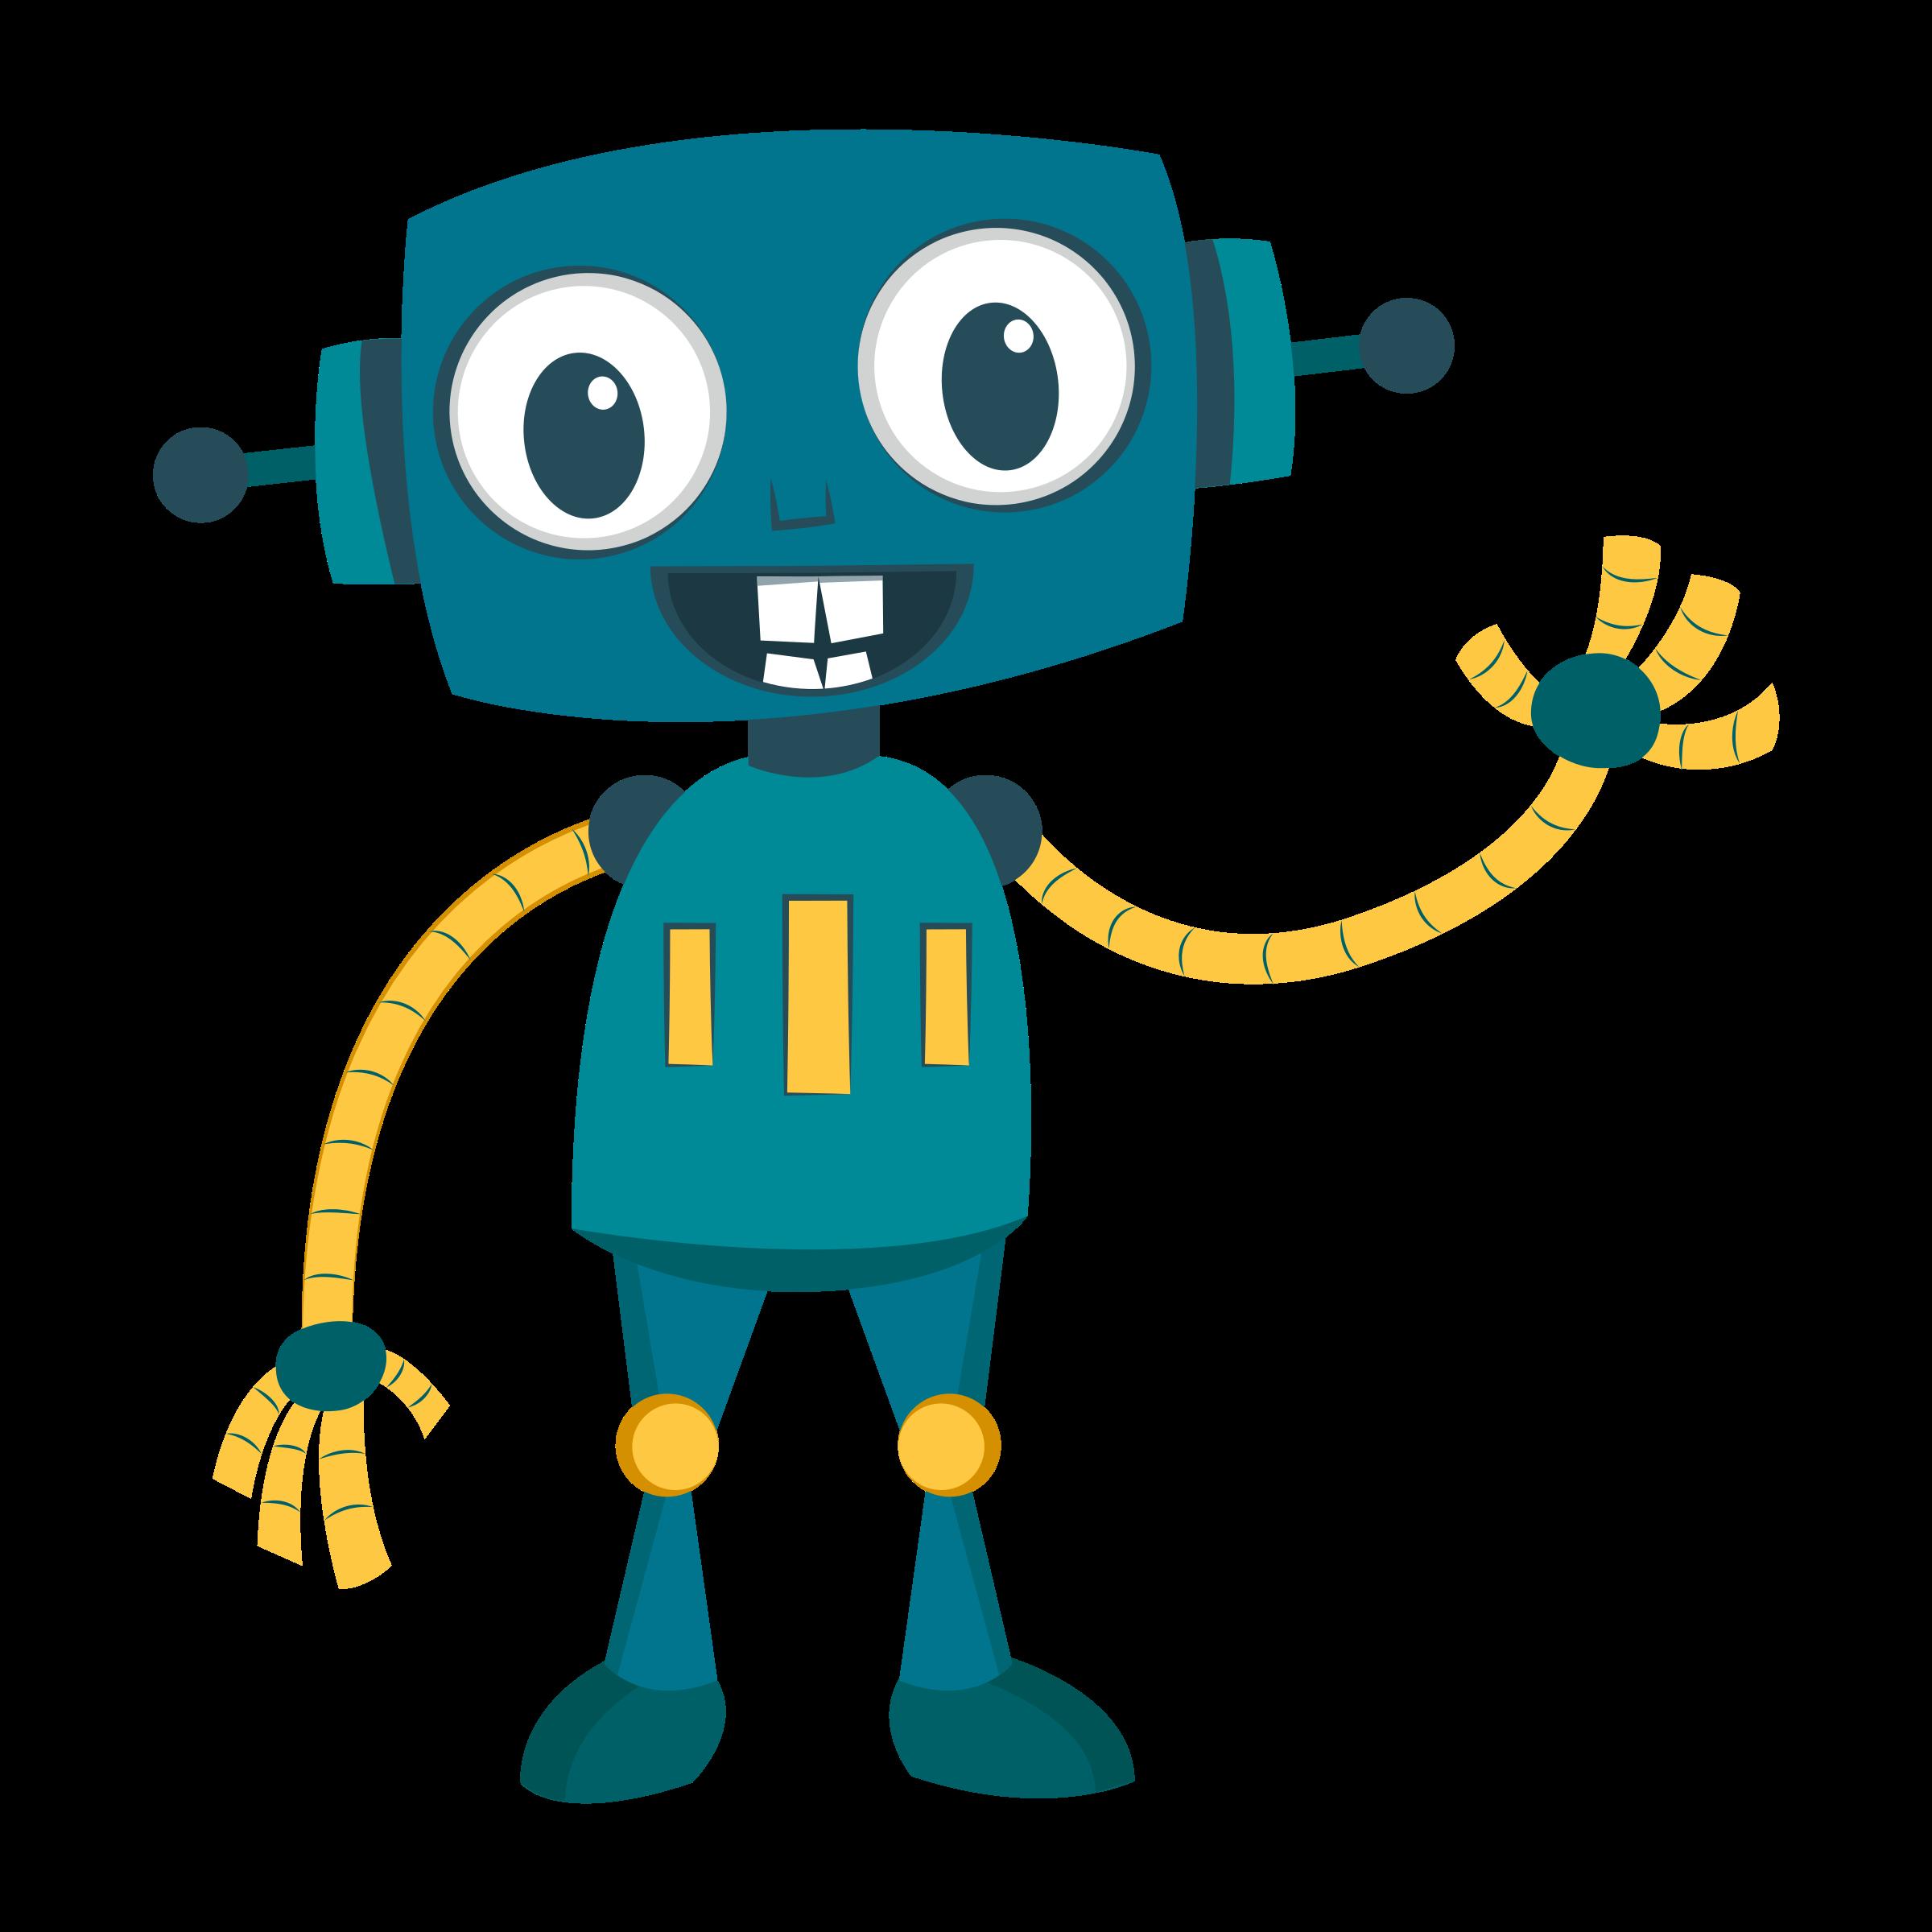 Robot PNG Image | Robot png, Cartoon people, Png images